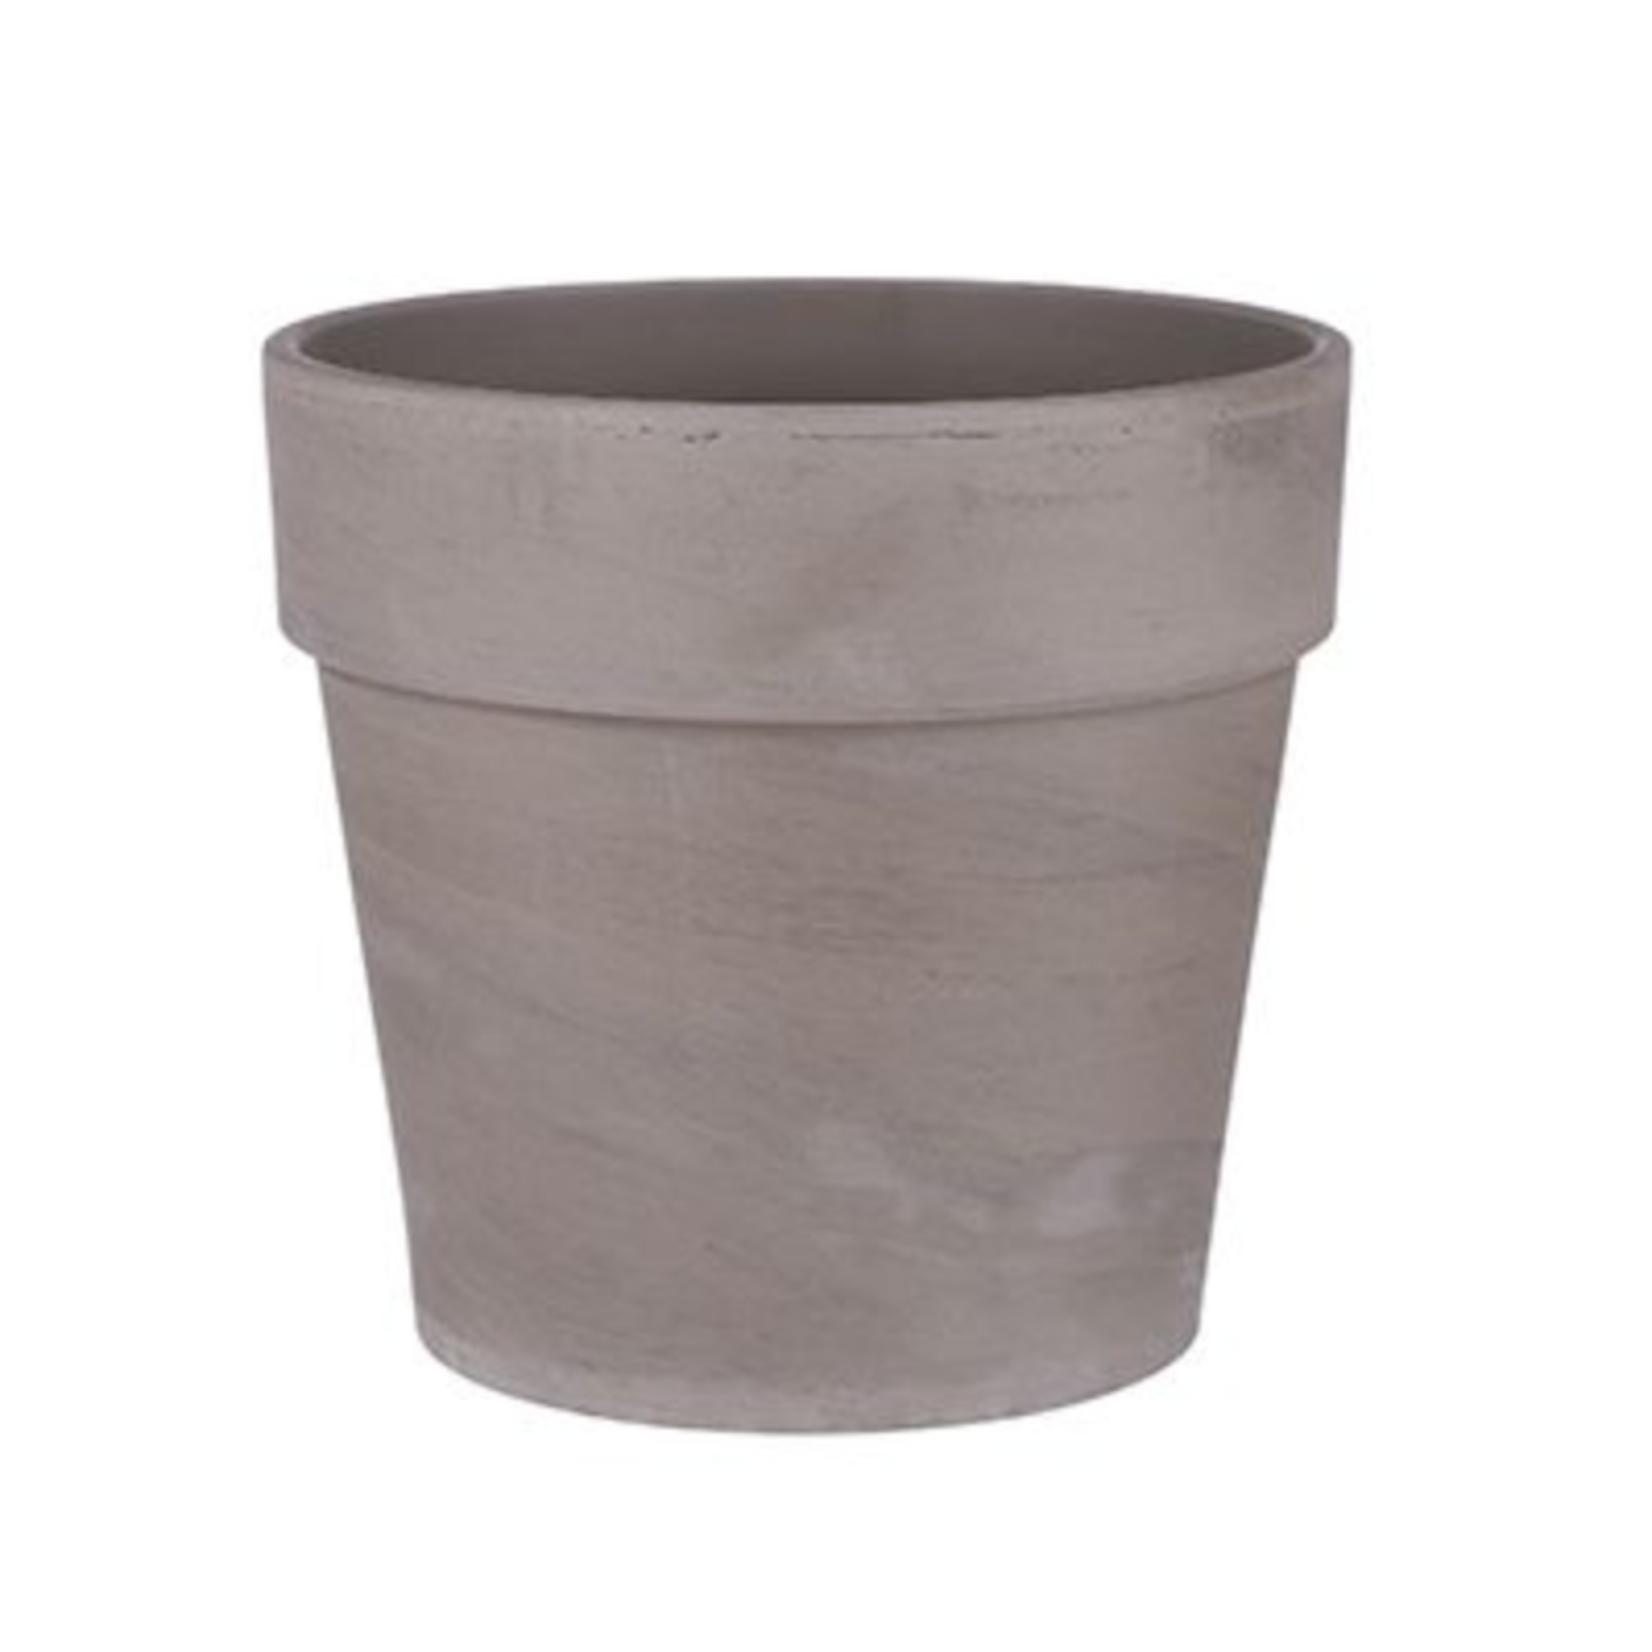 Edelman Carina grijs basalt ∅ 21